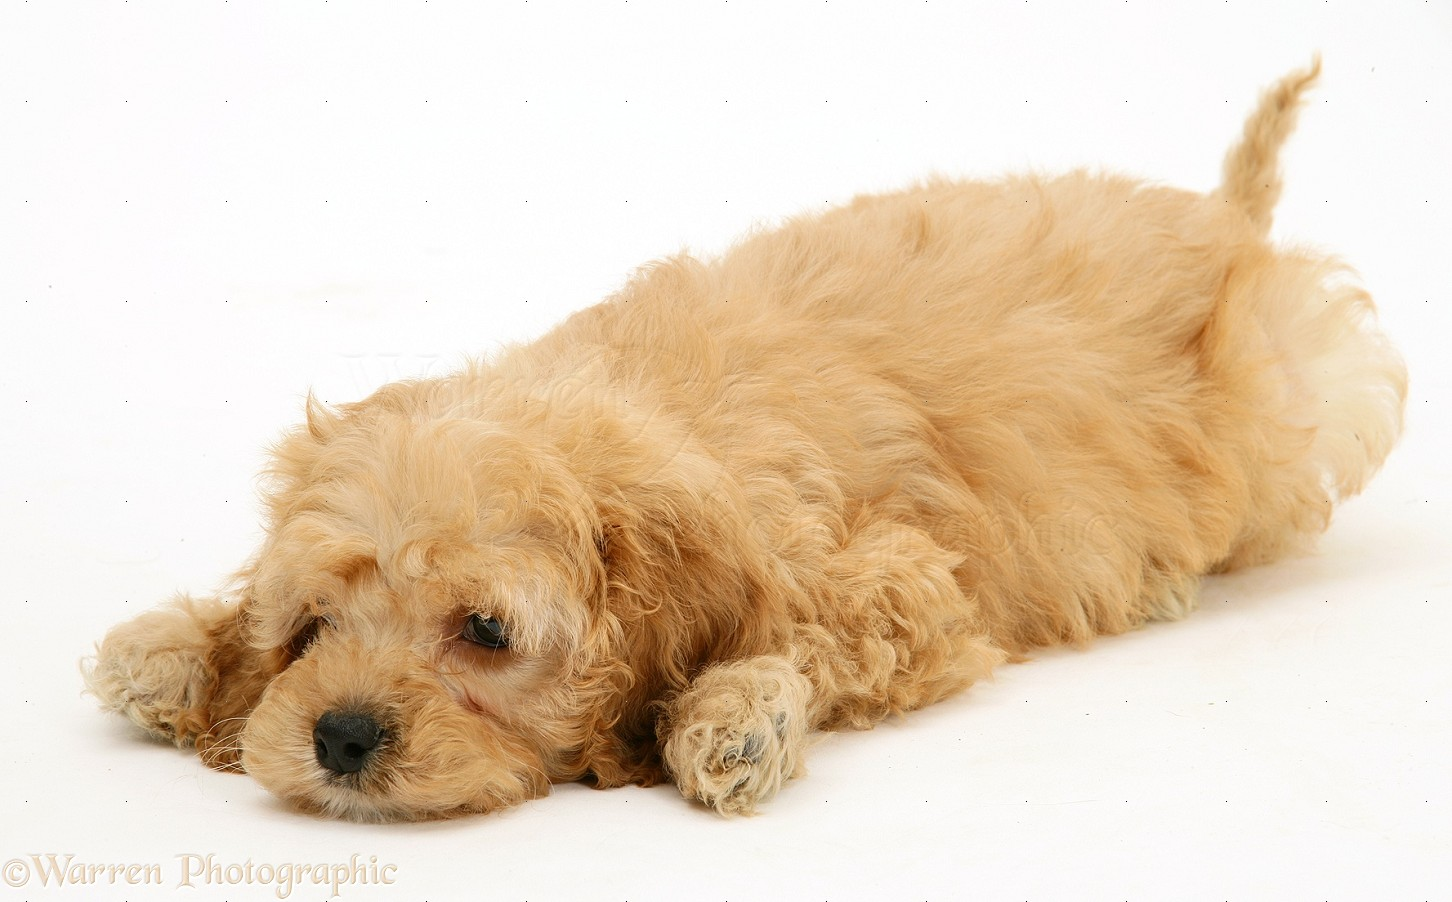 Dog American Cockapoo Puppy 8 Weeks Old Photo Wp17022